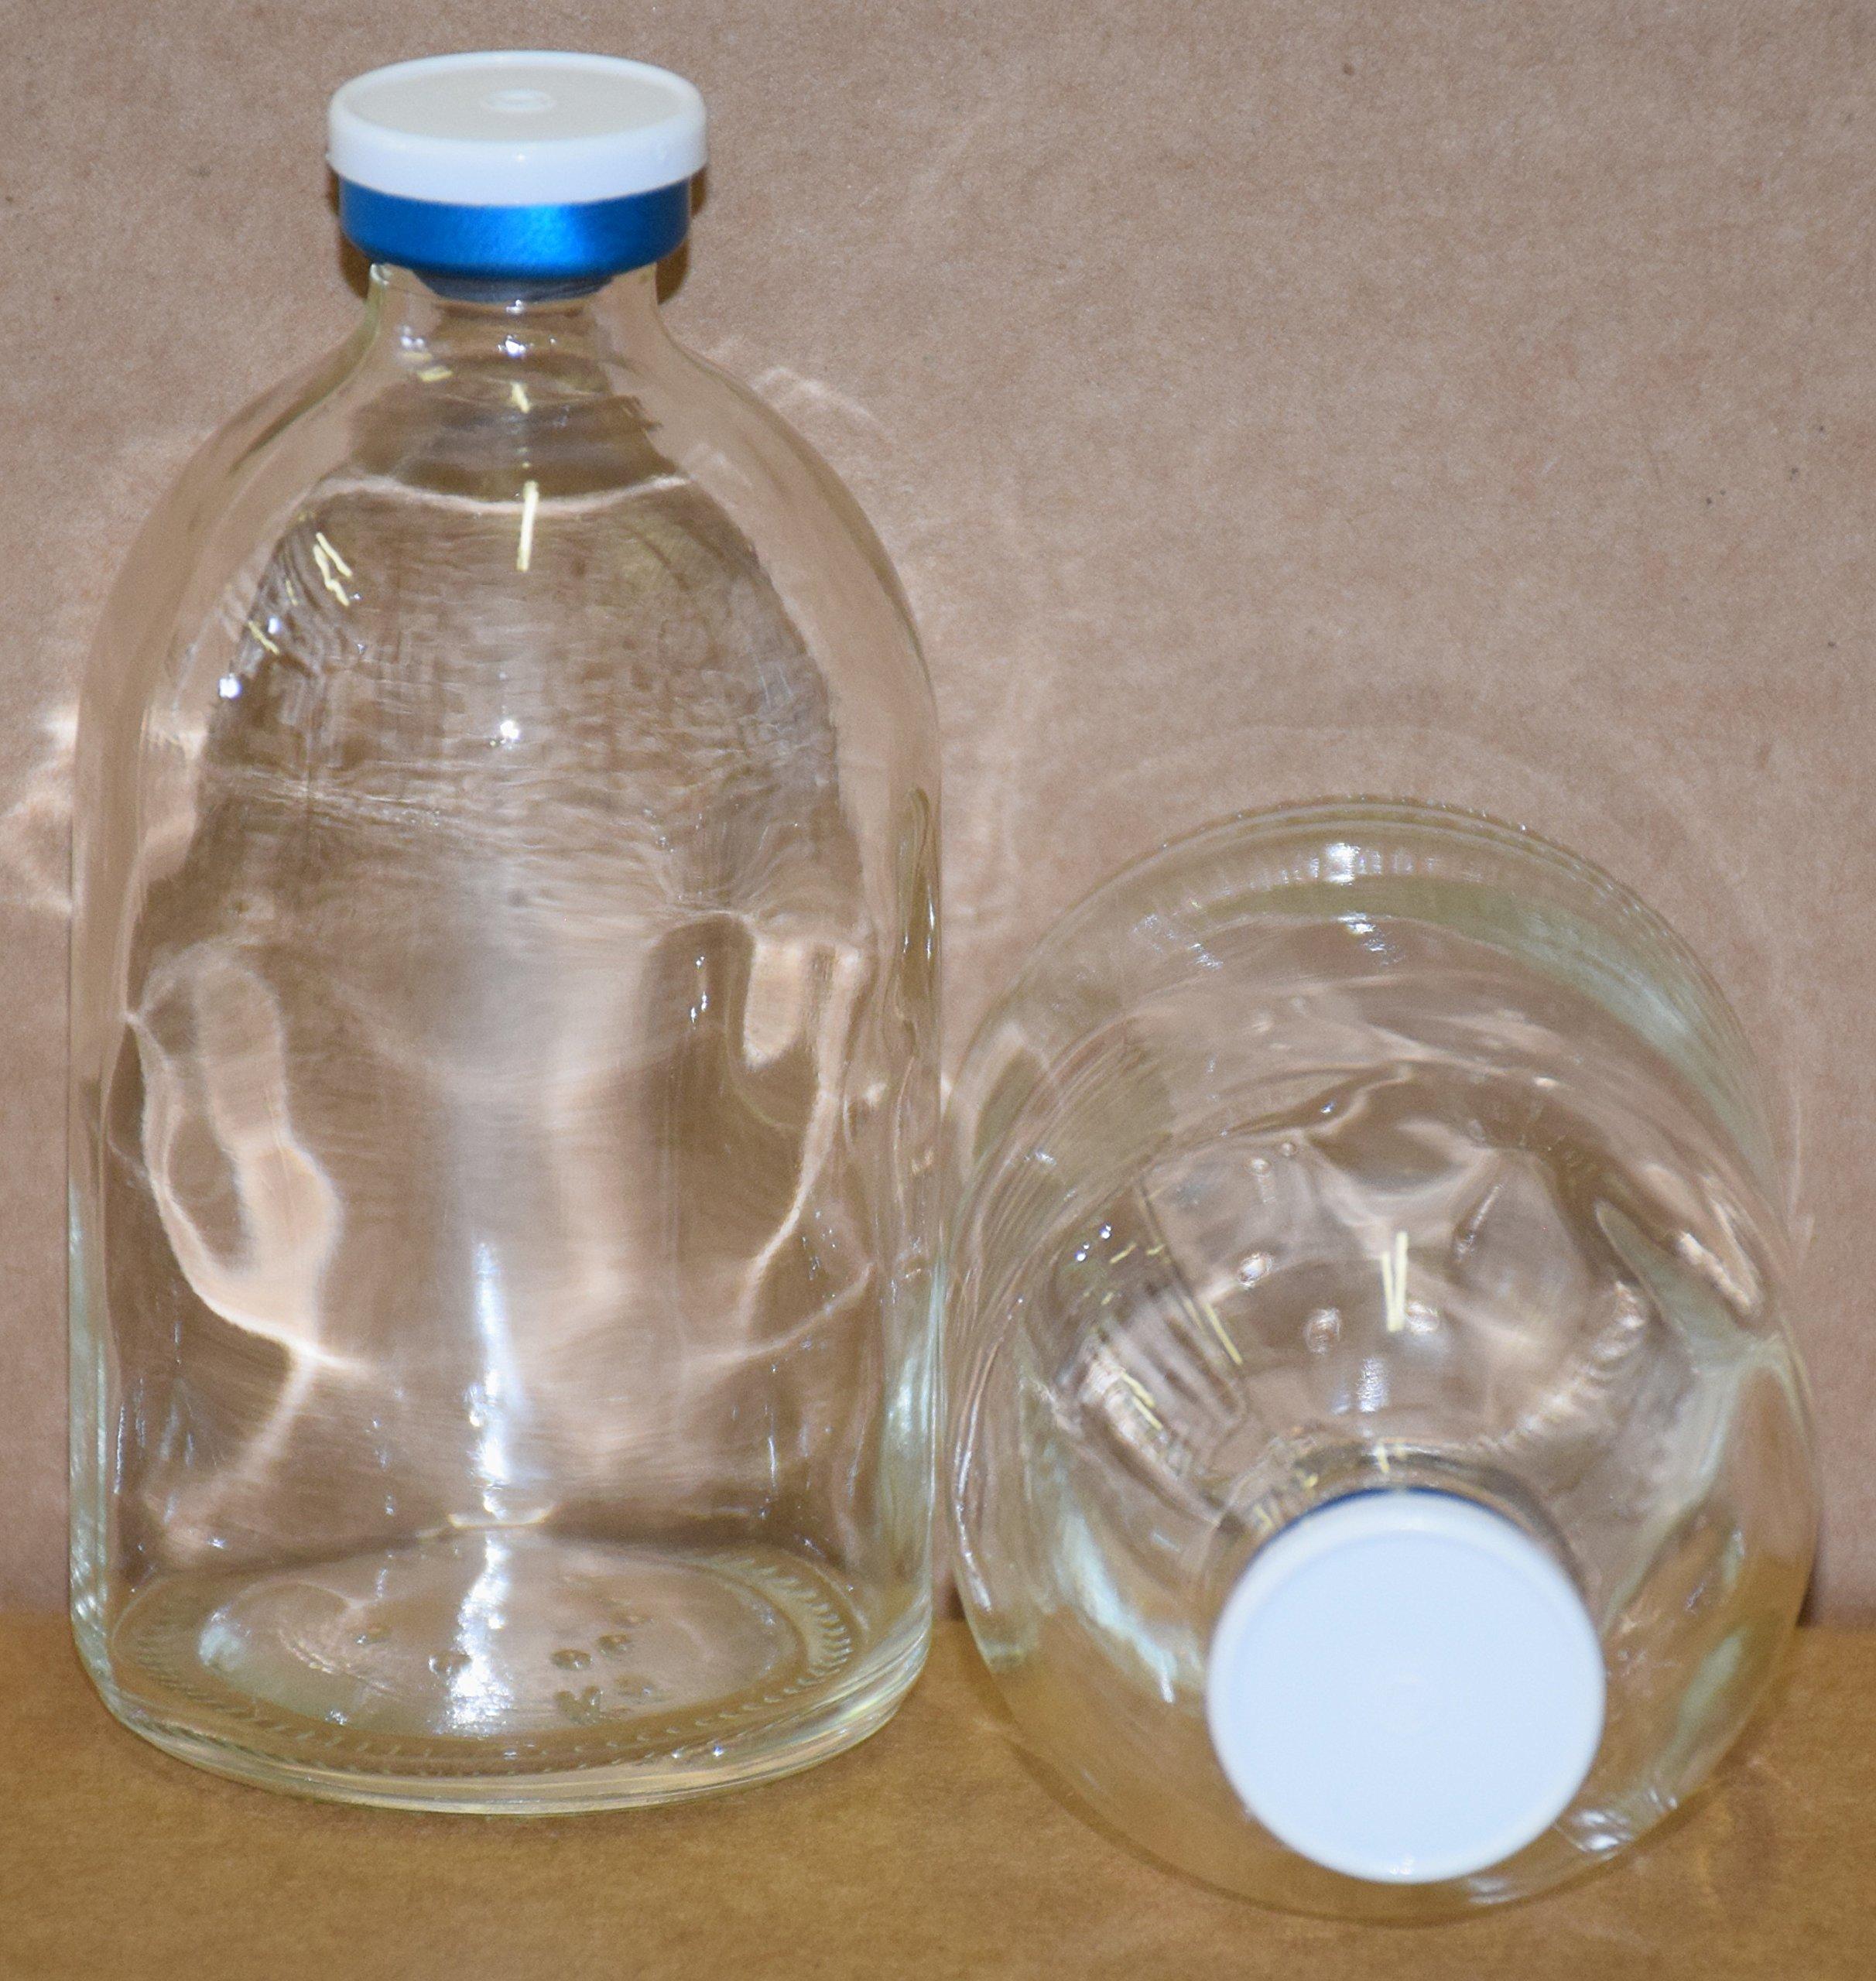 100 mL Clear Sterile Vial With White & Blue Plain Flip Cap Seal (50)